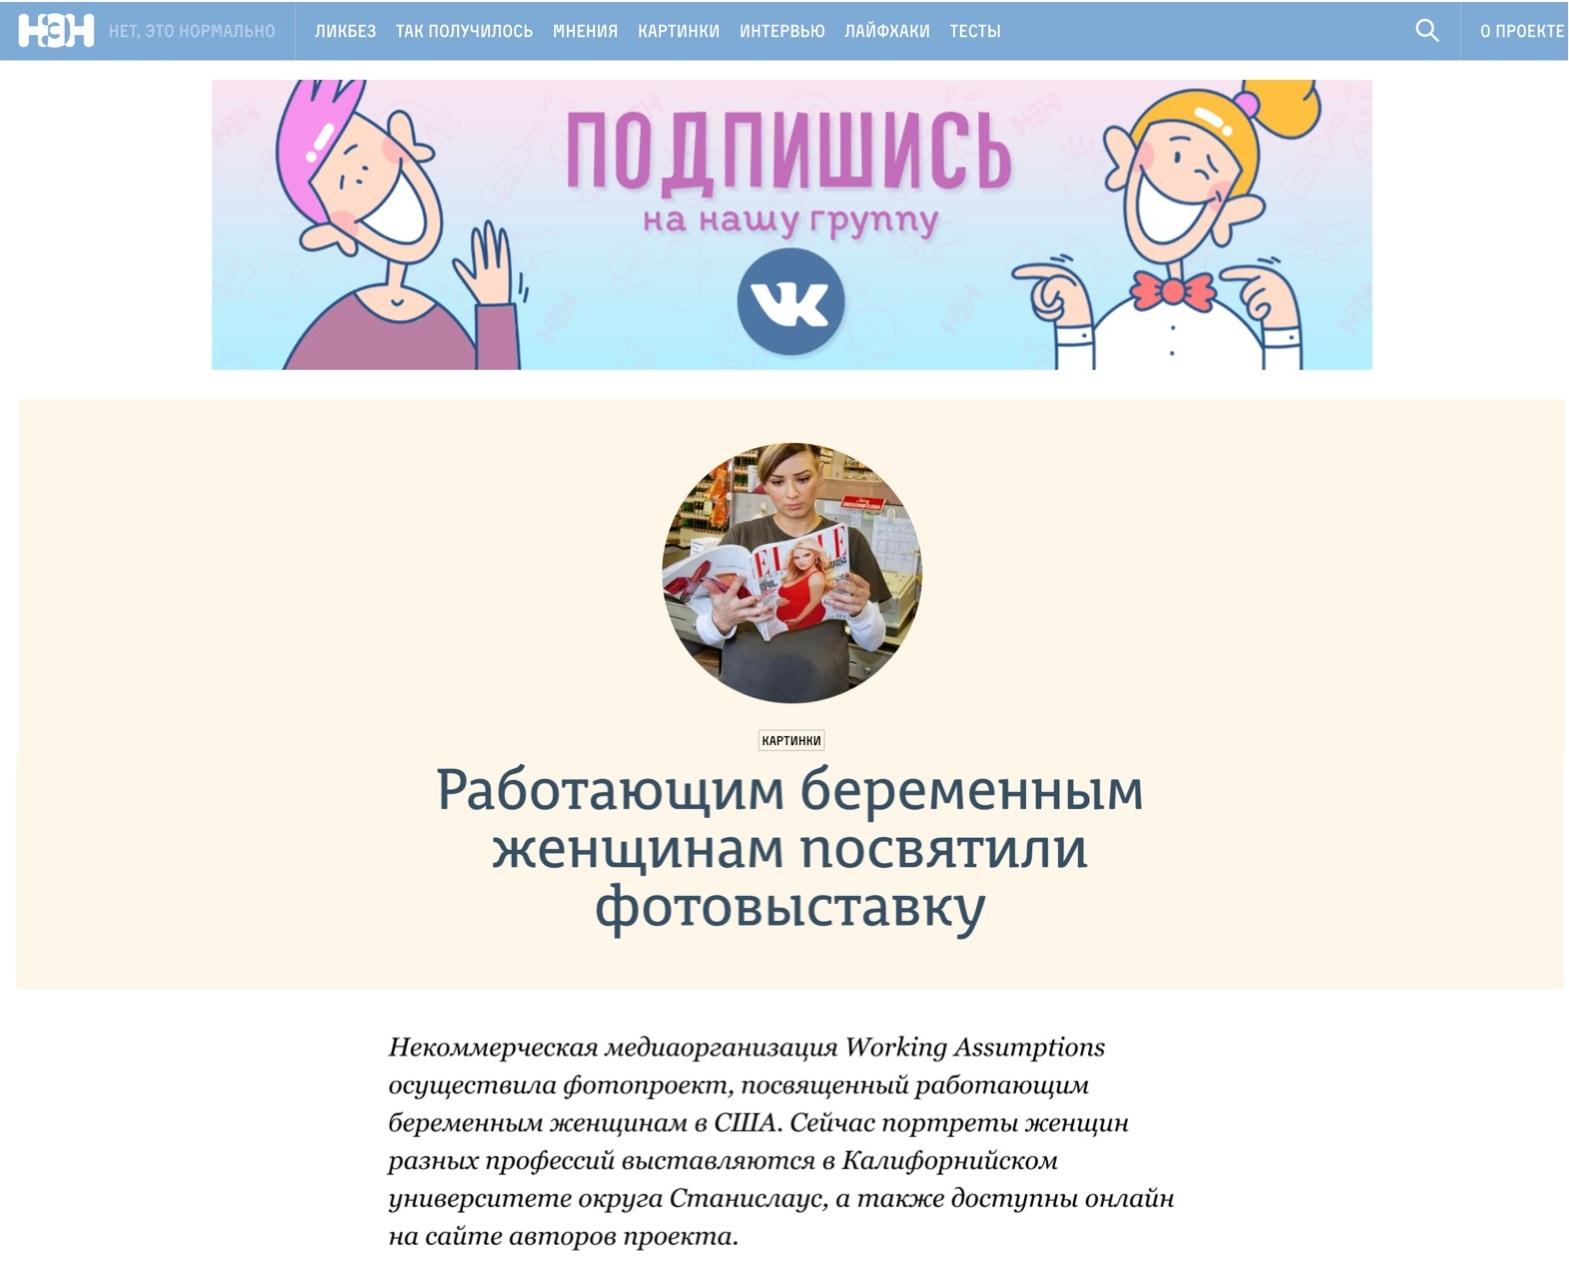 Russian+article.jpg